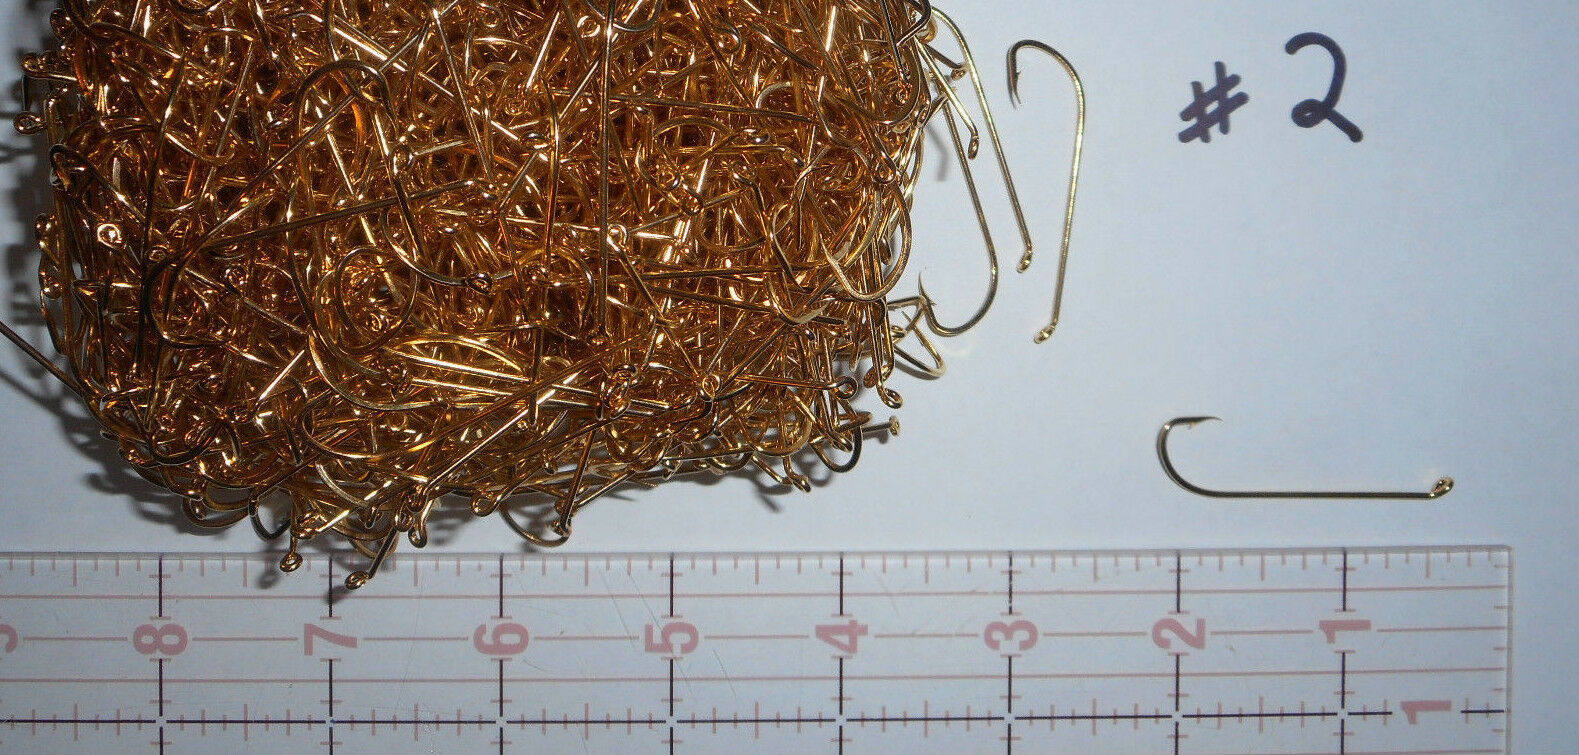 20,800 MUSTAD  2 Fly Tying RIG MAKING oroPLATED BULK fishing hooks 92614